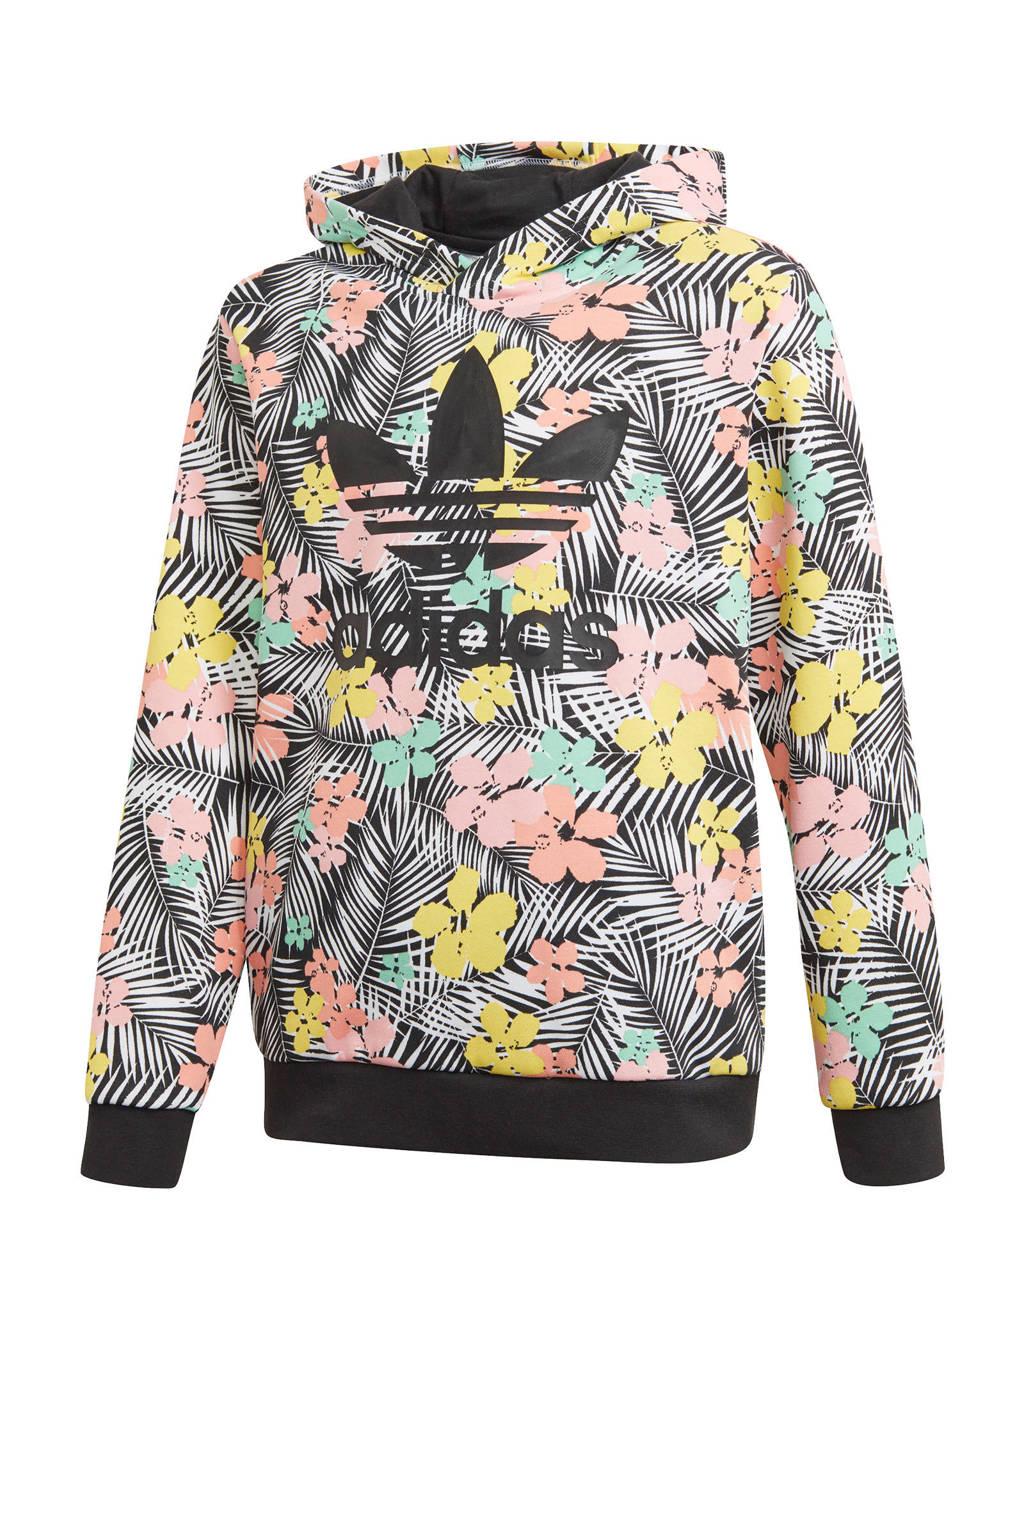 adidas Originals hoodie zwart/multi, Zwart/multi